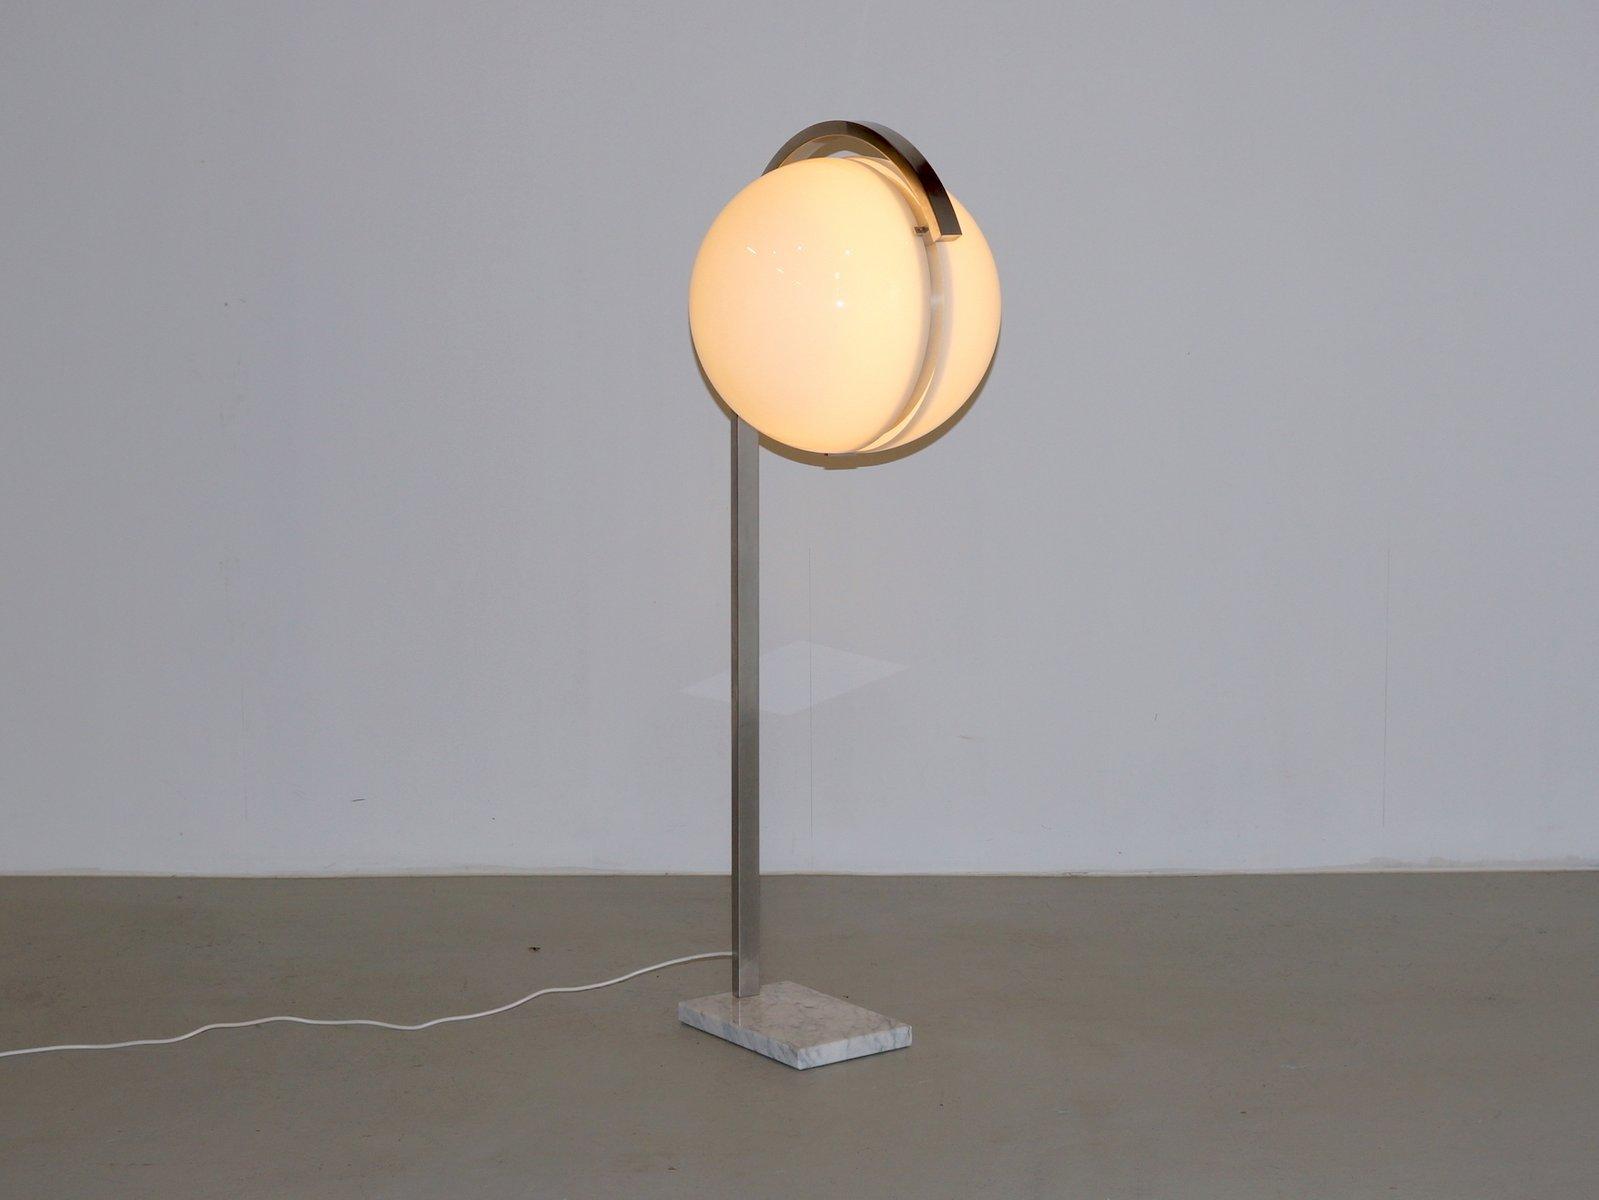 Acrylic globe floor lamp on carrara marble base from acciarri acrylic globe floor lamp on carrara marble base from acciarri 1960s aloadofball Choice Image